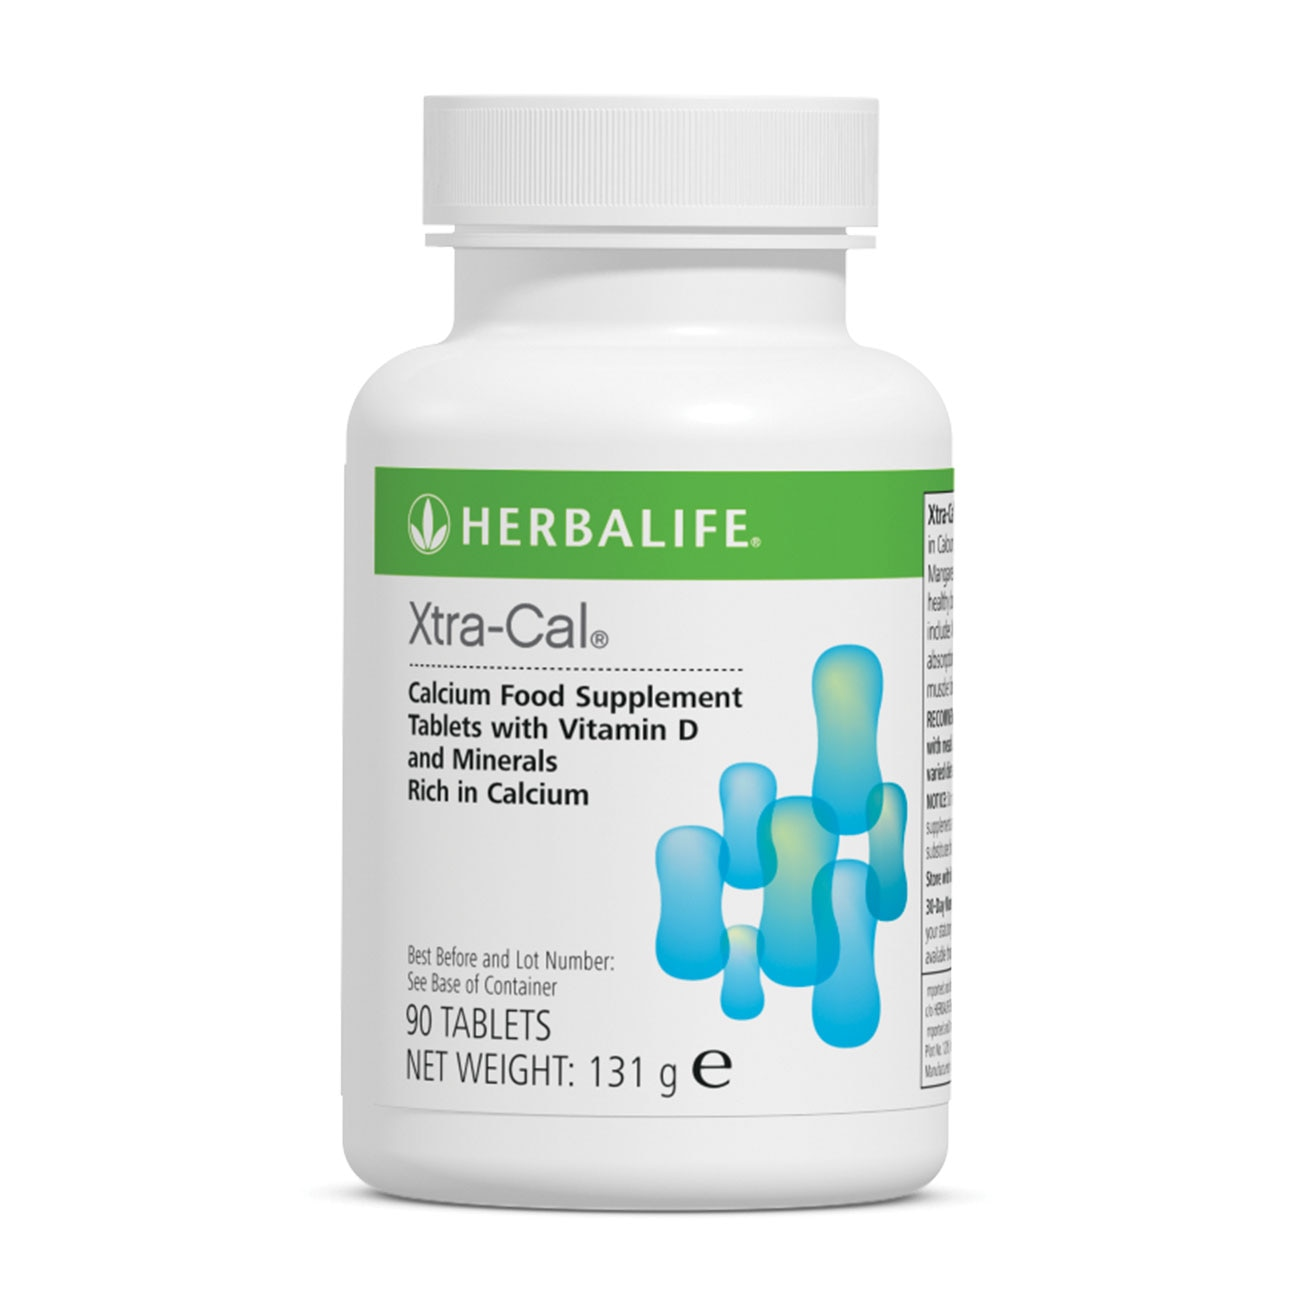 Herbalife Nutrition Xtra-Cal Calcium Food Supplement 90 Tablets Vitamin D Minerals Magnesium Zinc Copper Manganese Healthy Life